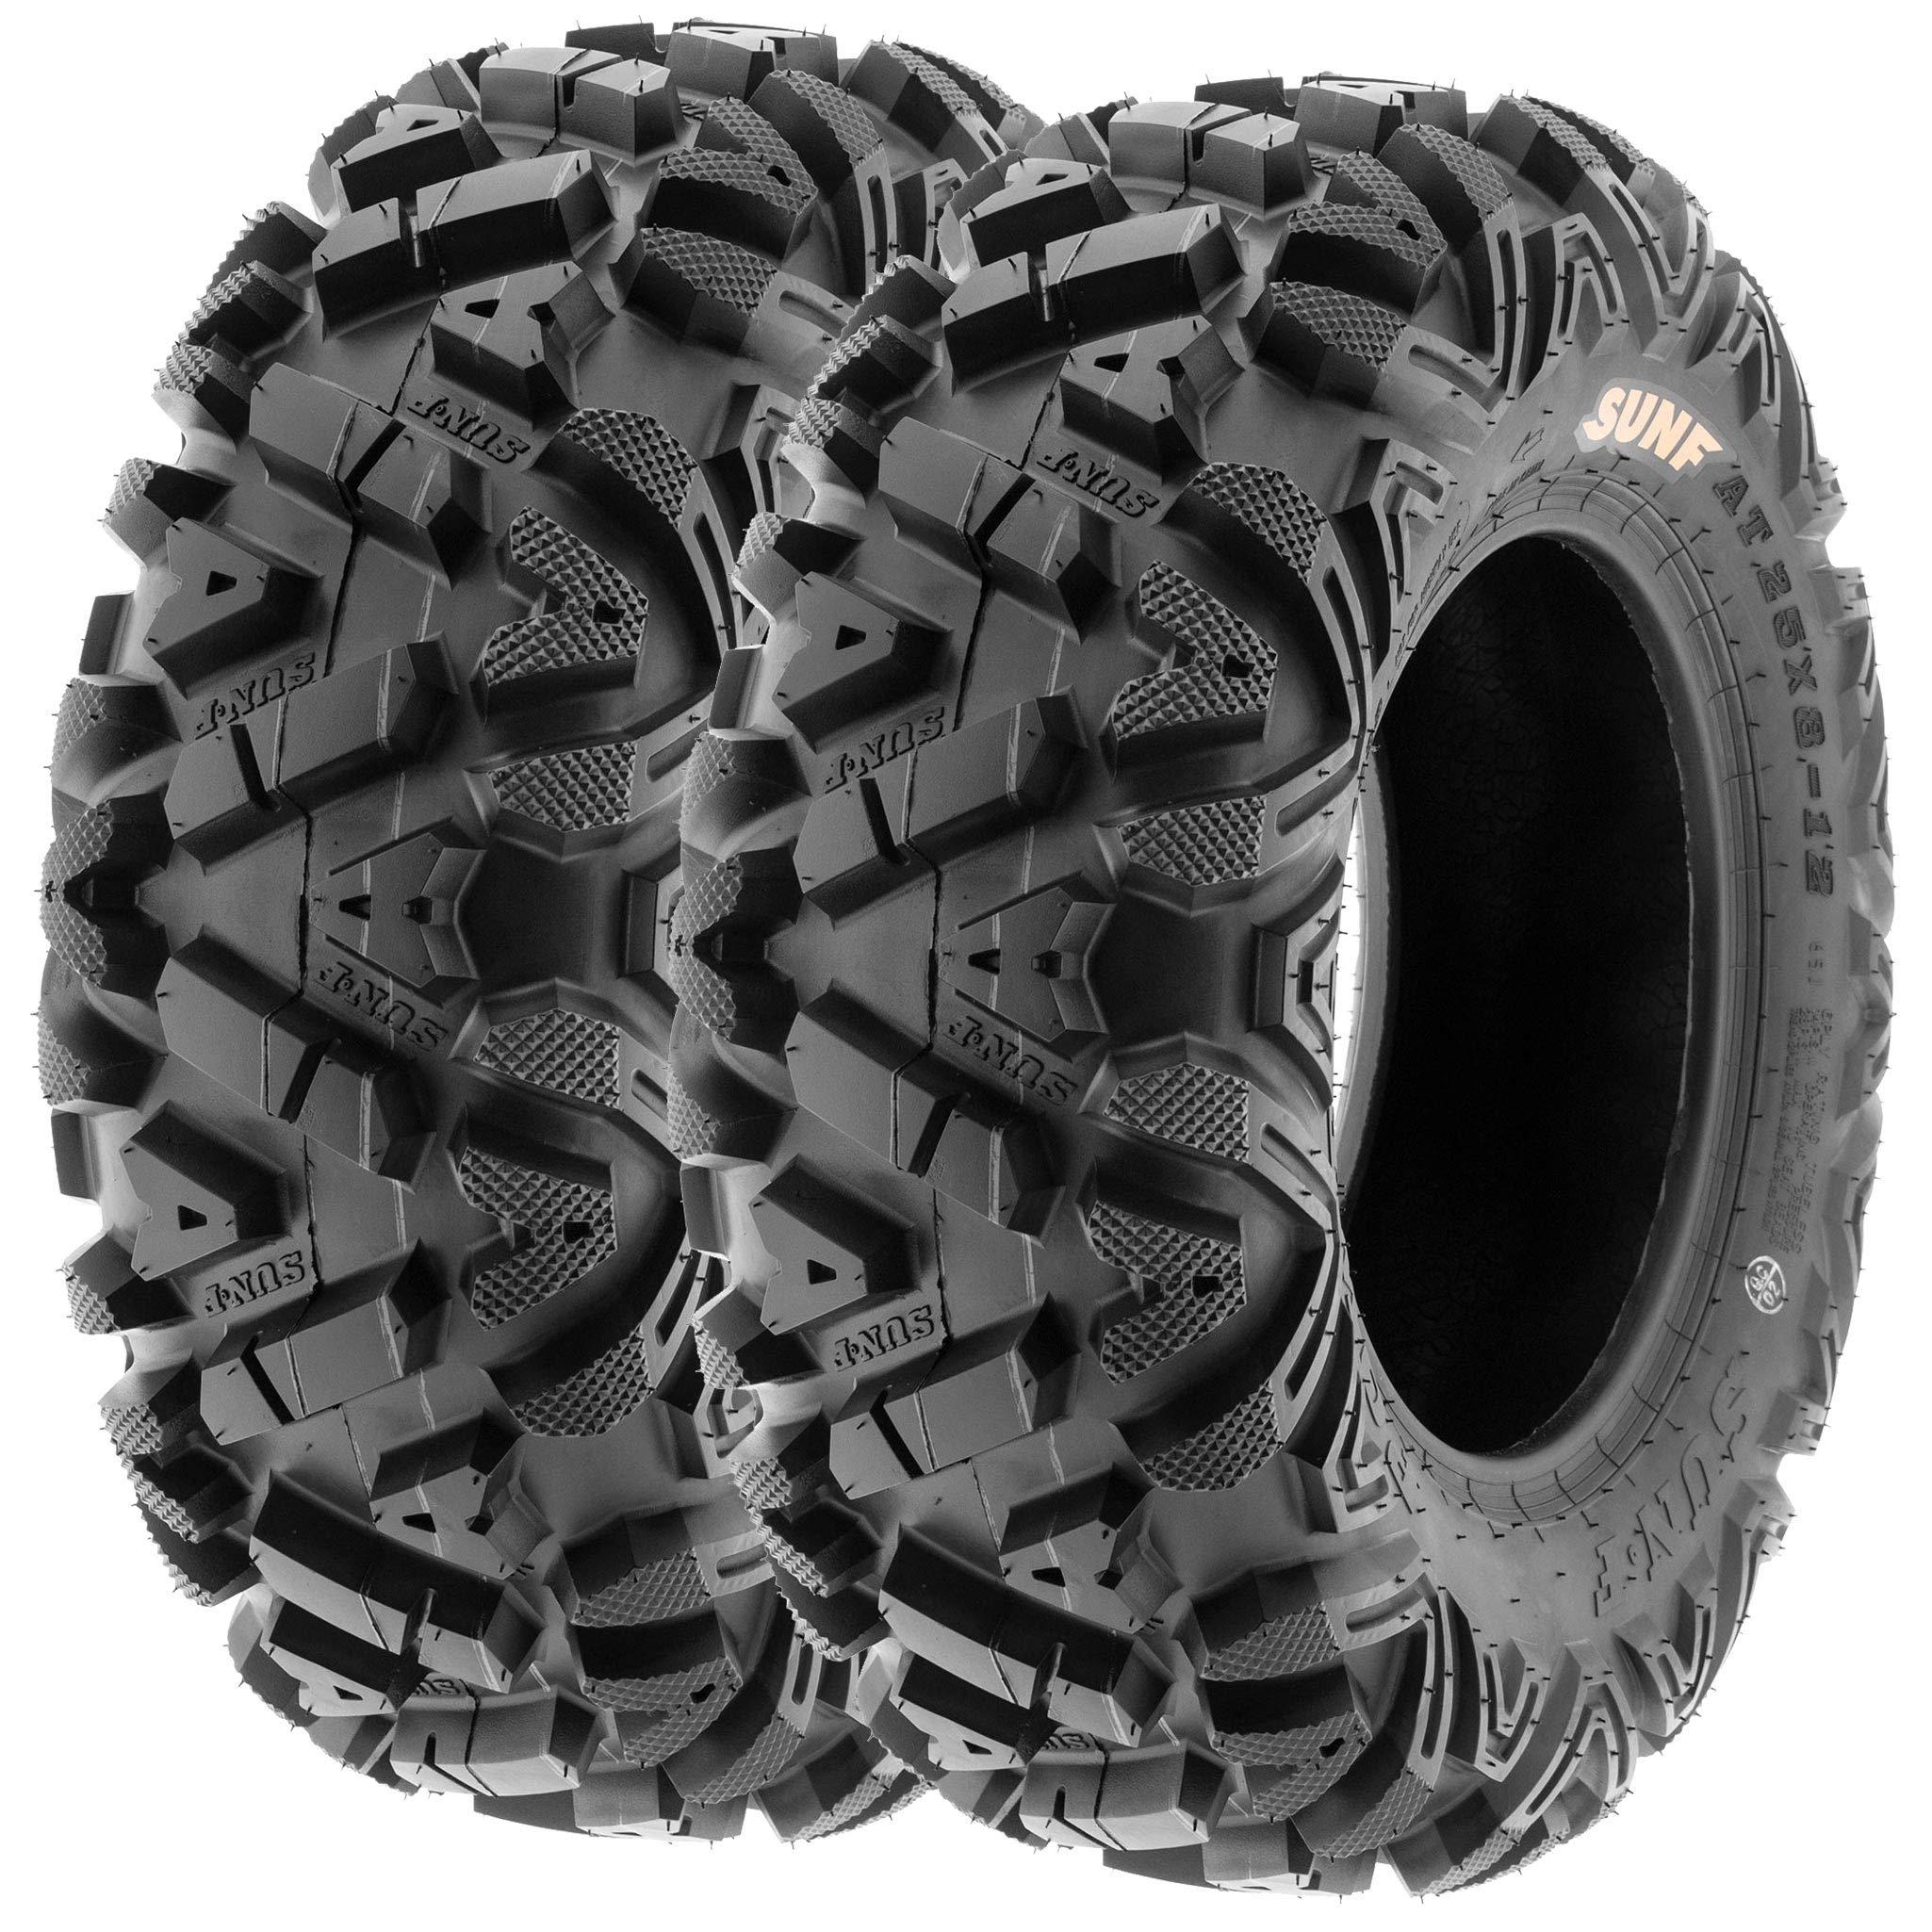 Set of 4 SunF Power.I ATV/UTV AT all-terrain Tires 24x8-11 Front & 24x11-10 Rear, 6 PR, Tubeless A033 by SUNF (Image #2)